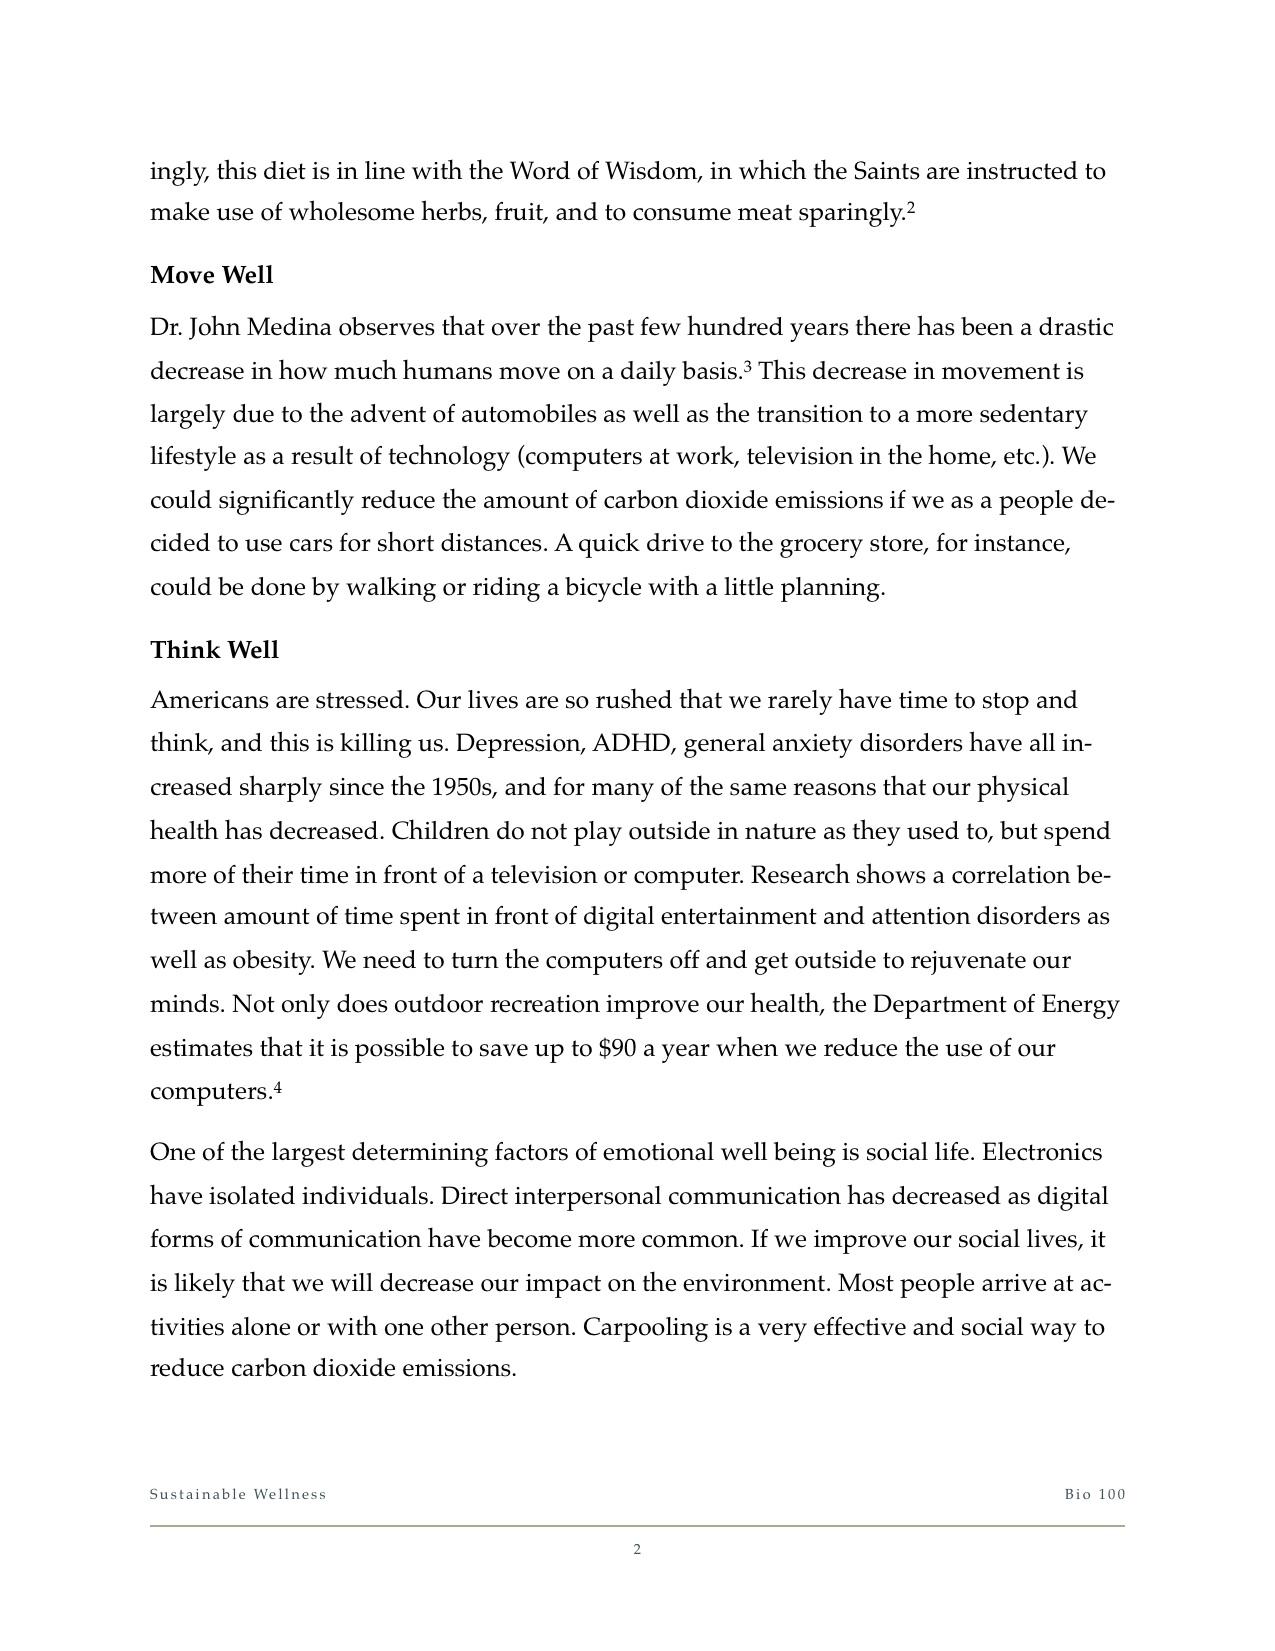 Final Bio Paper 3.jpg